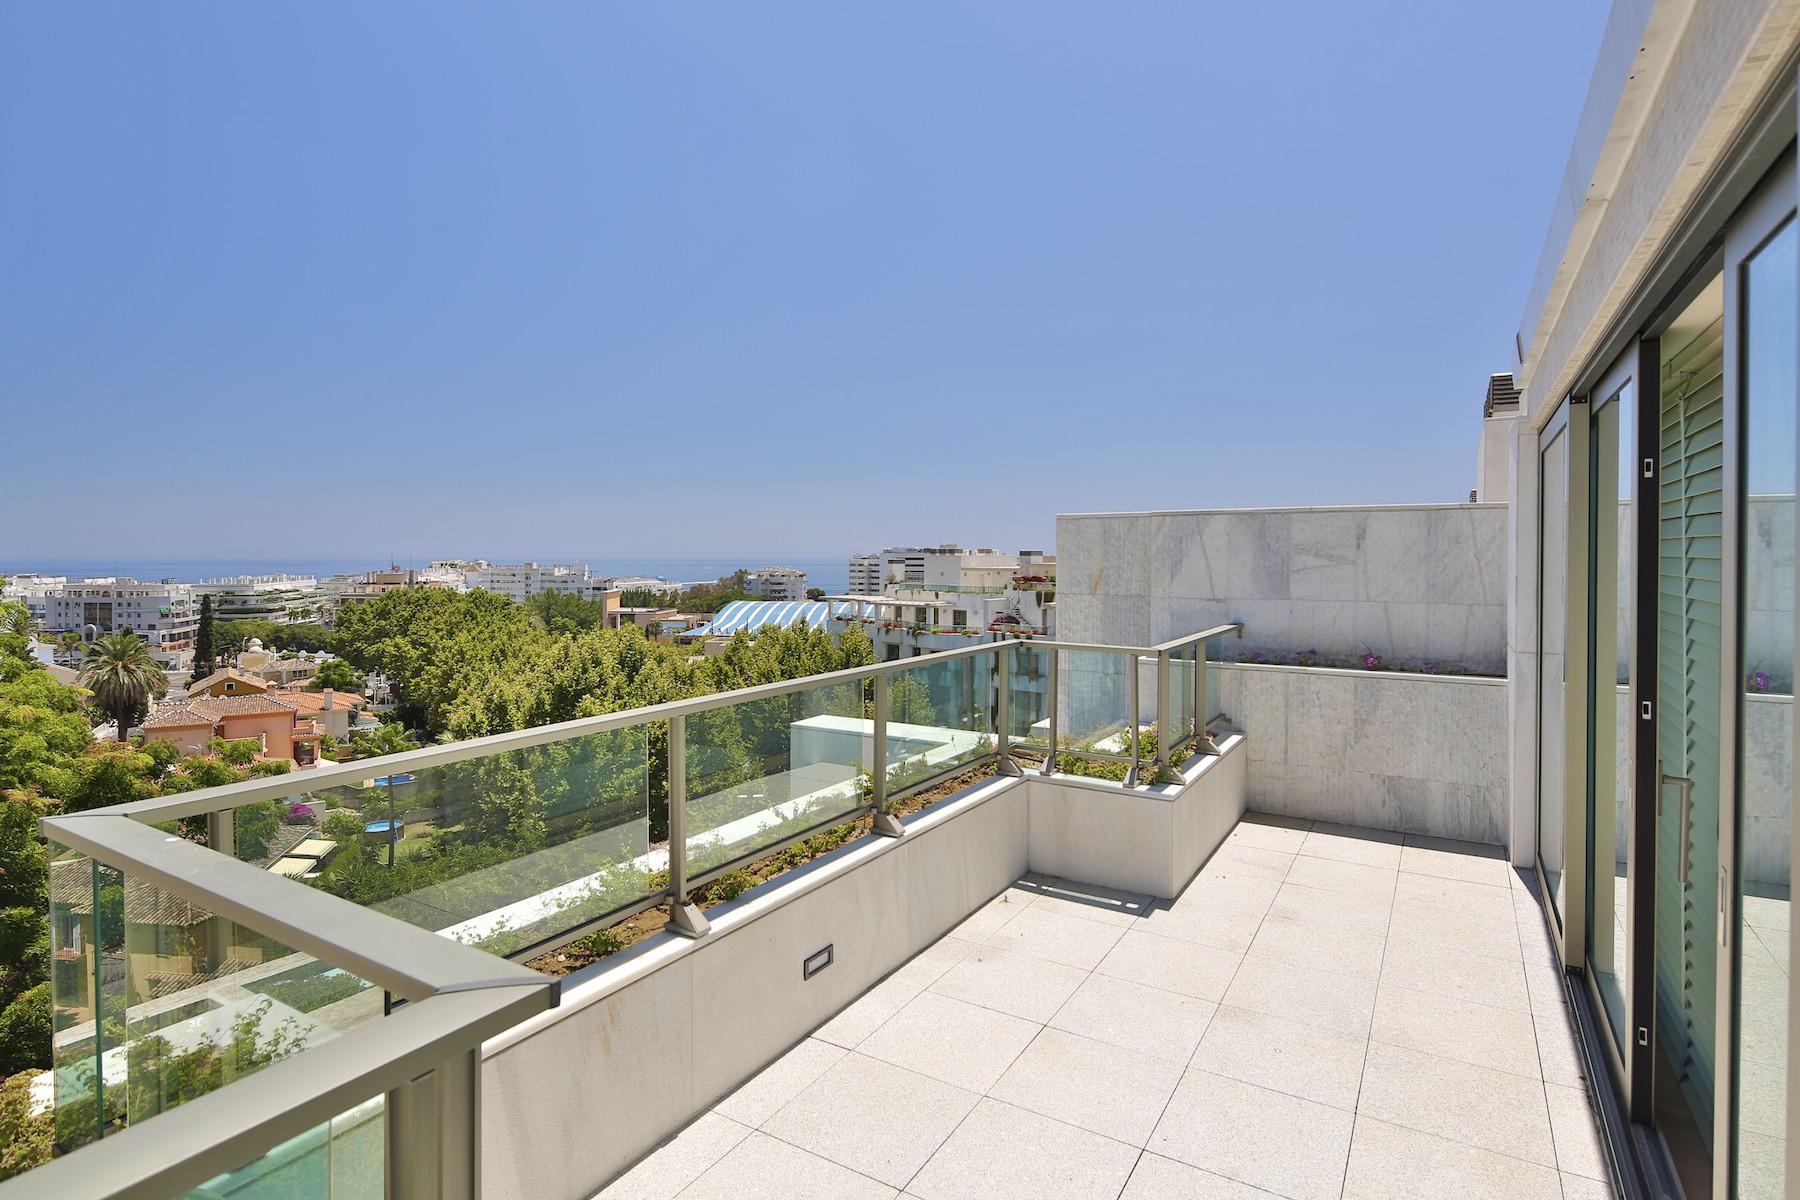 Loft/Duplex pour l Vente à Duplex-Penthouse in Marbella Marbella, Costa Del Sol, 29600 Espagne